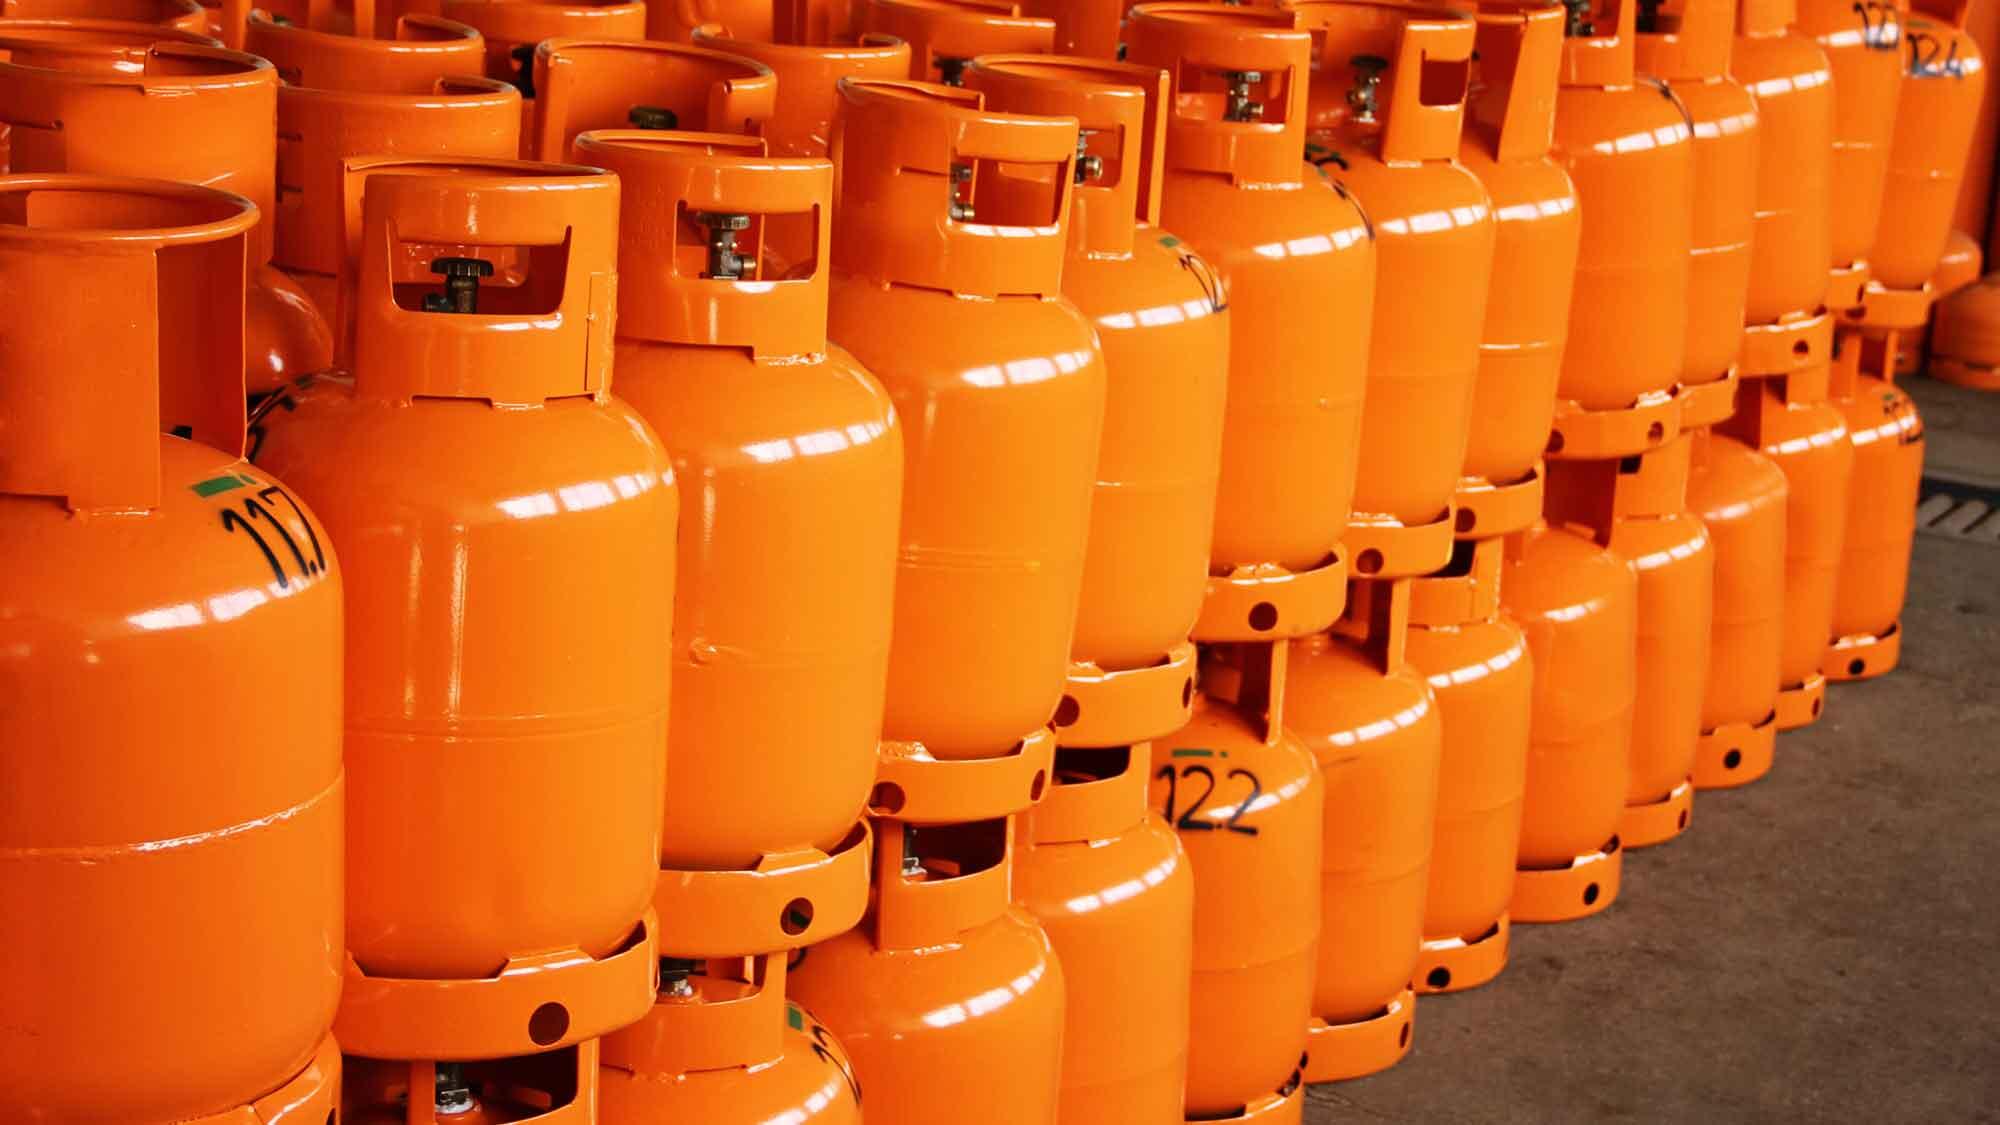 lpg boiler engineer essex maintenance leigh on sea orange tanks